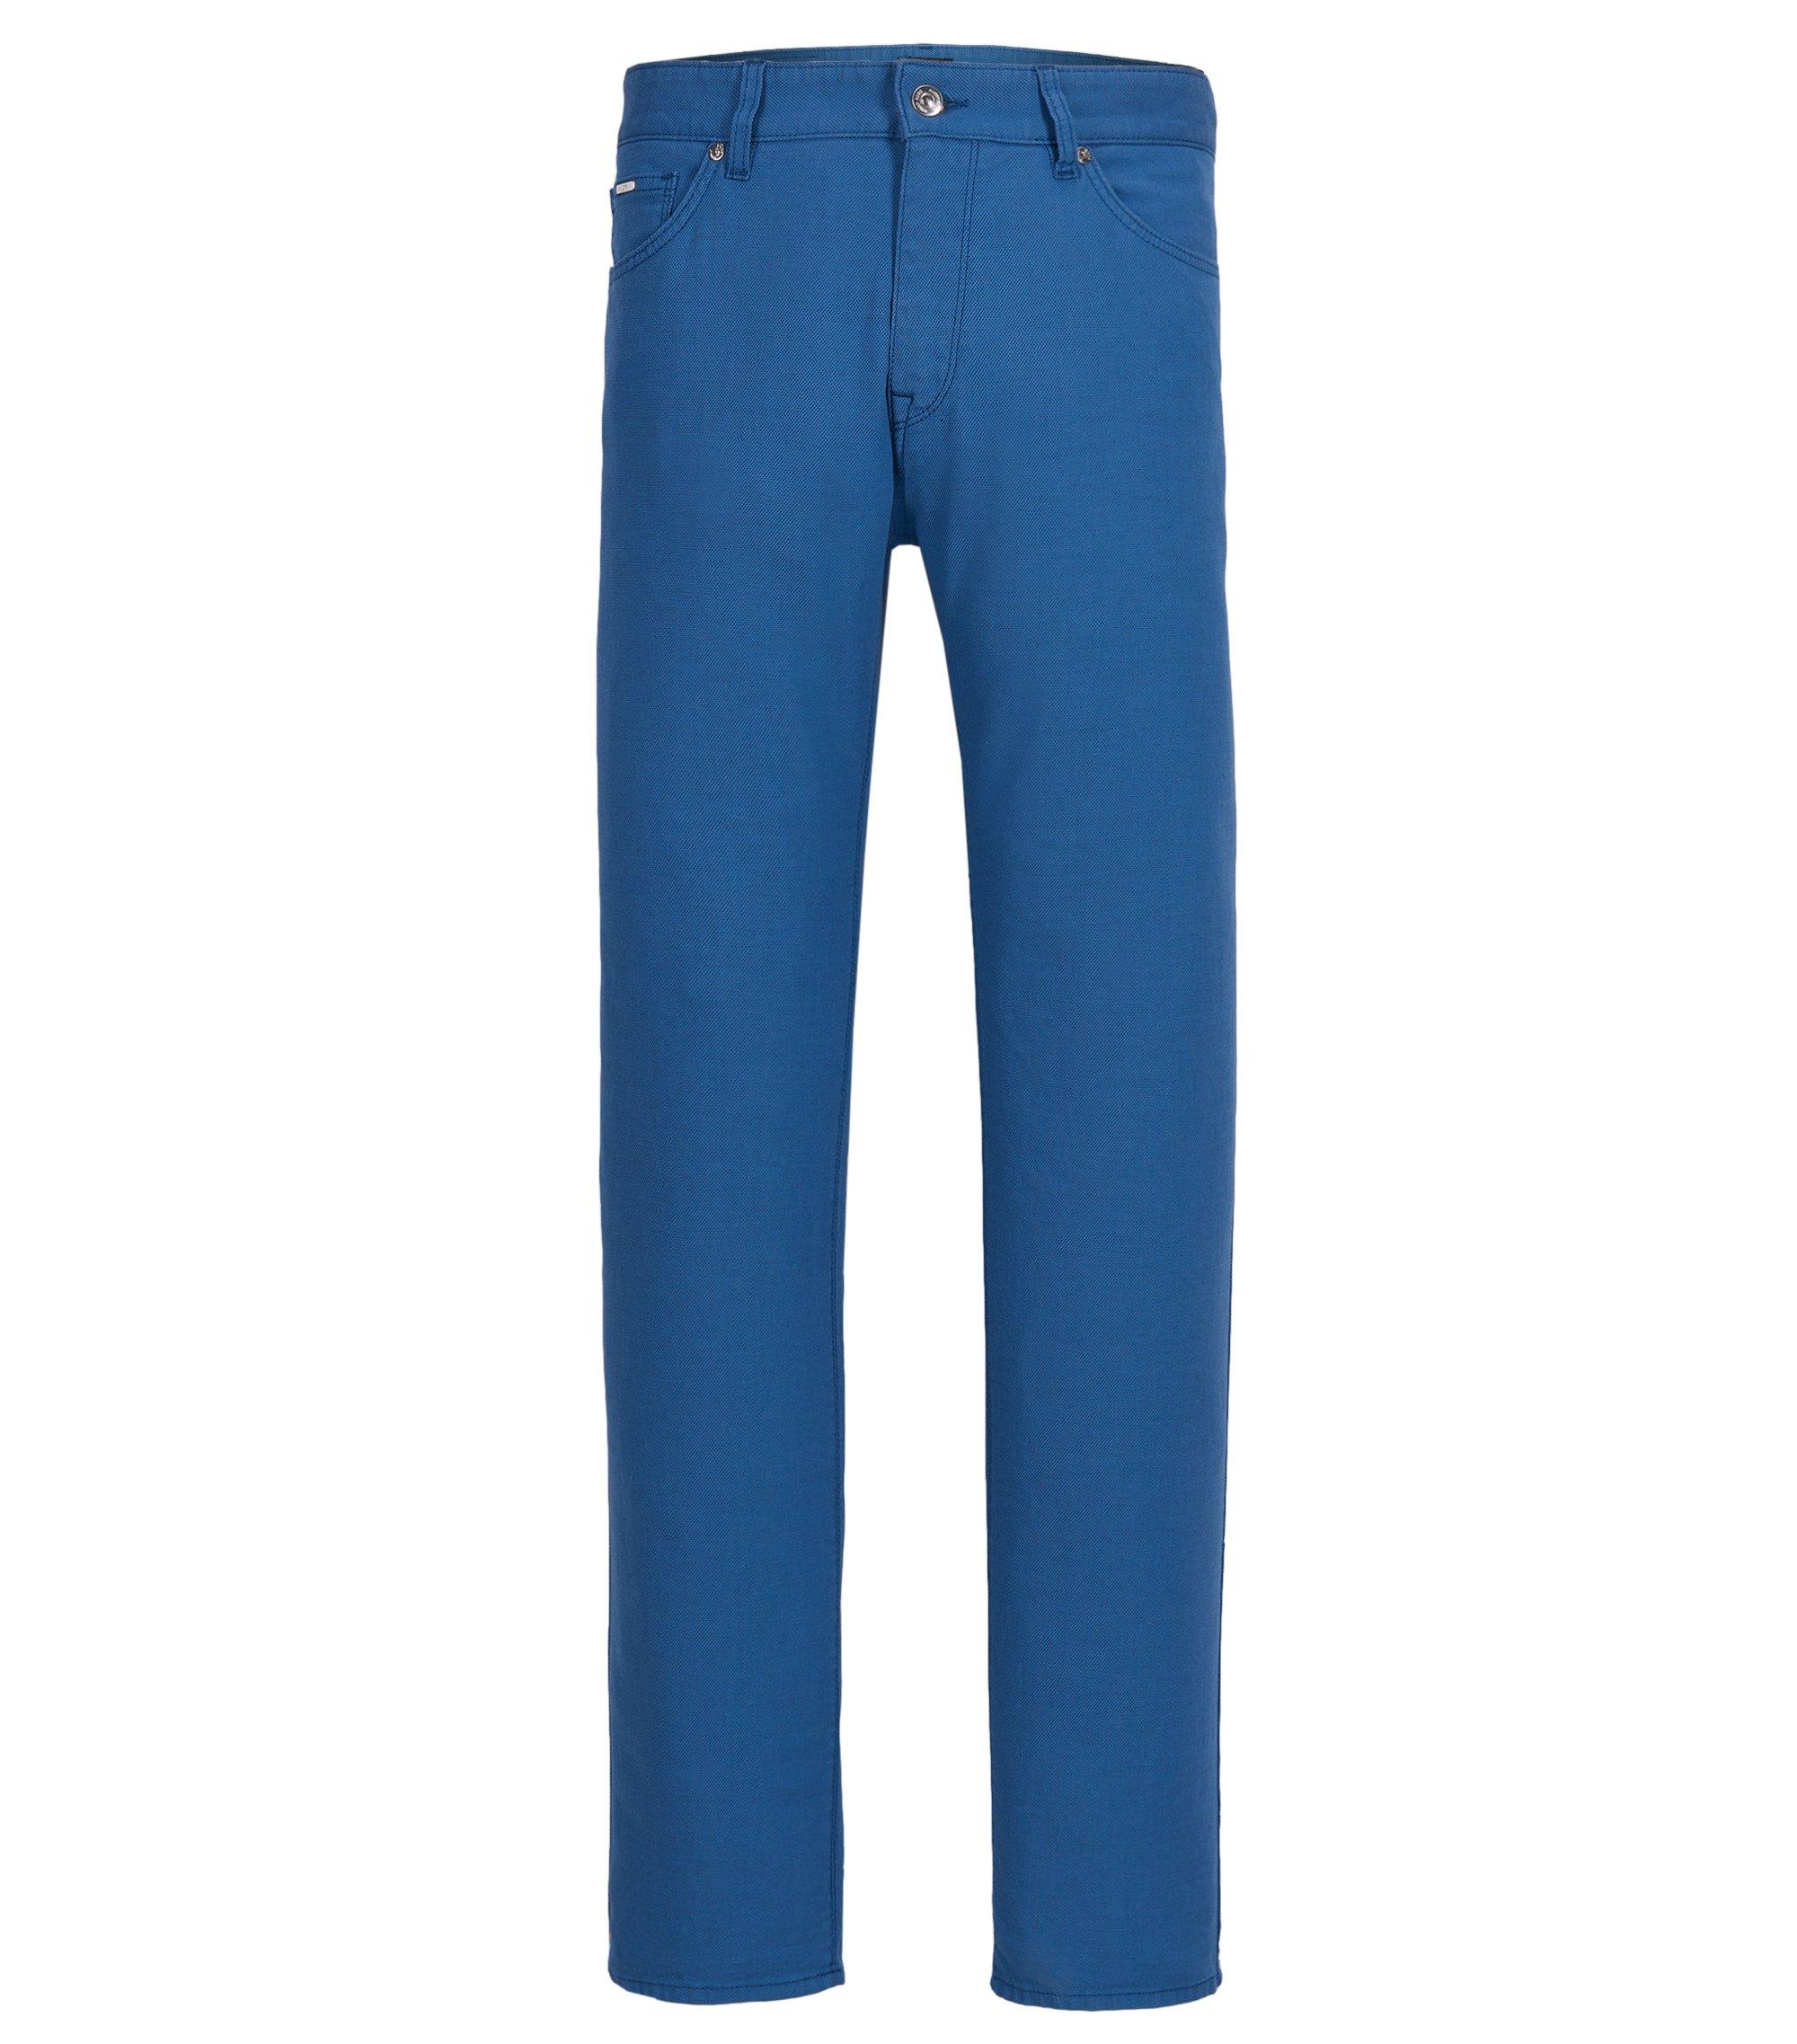 Stretch Cotton Pants, Regular Fit | Maine, Open Blue